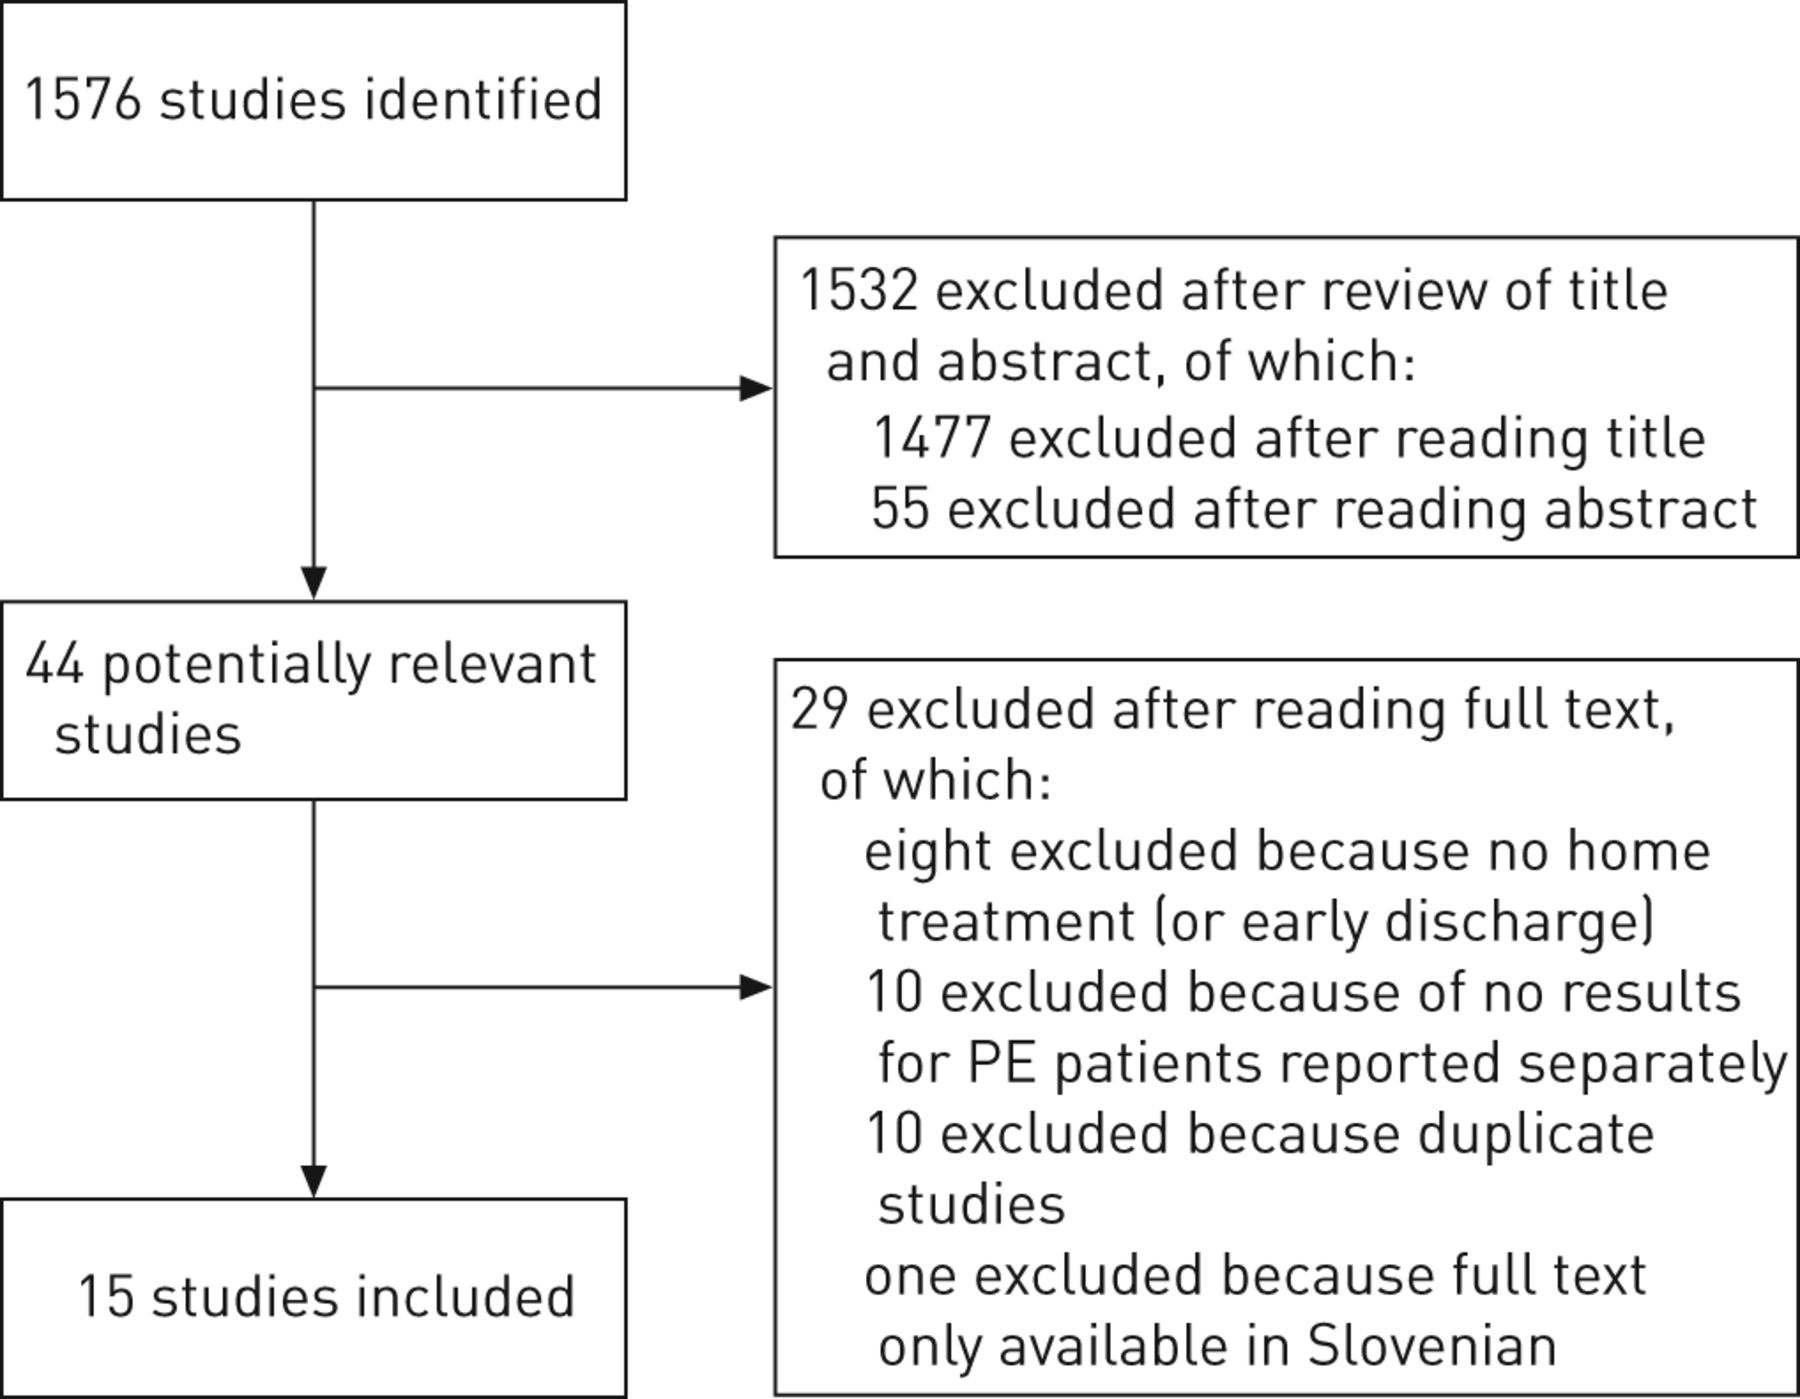 outpatient versus inpatient treatment in patients with pulmonary